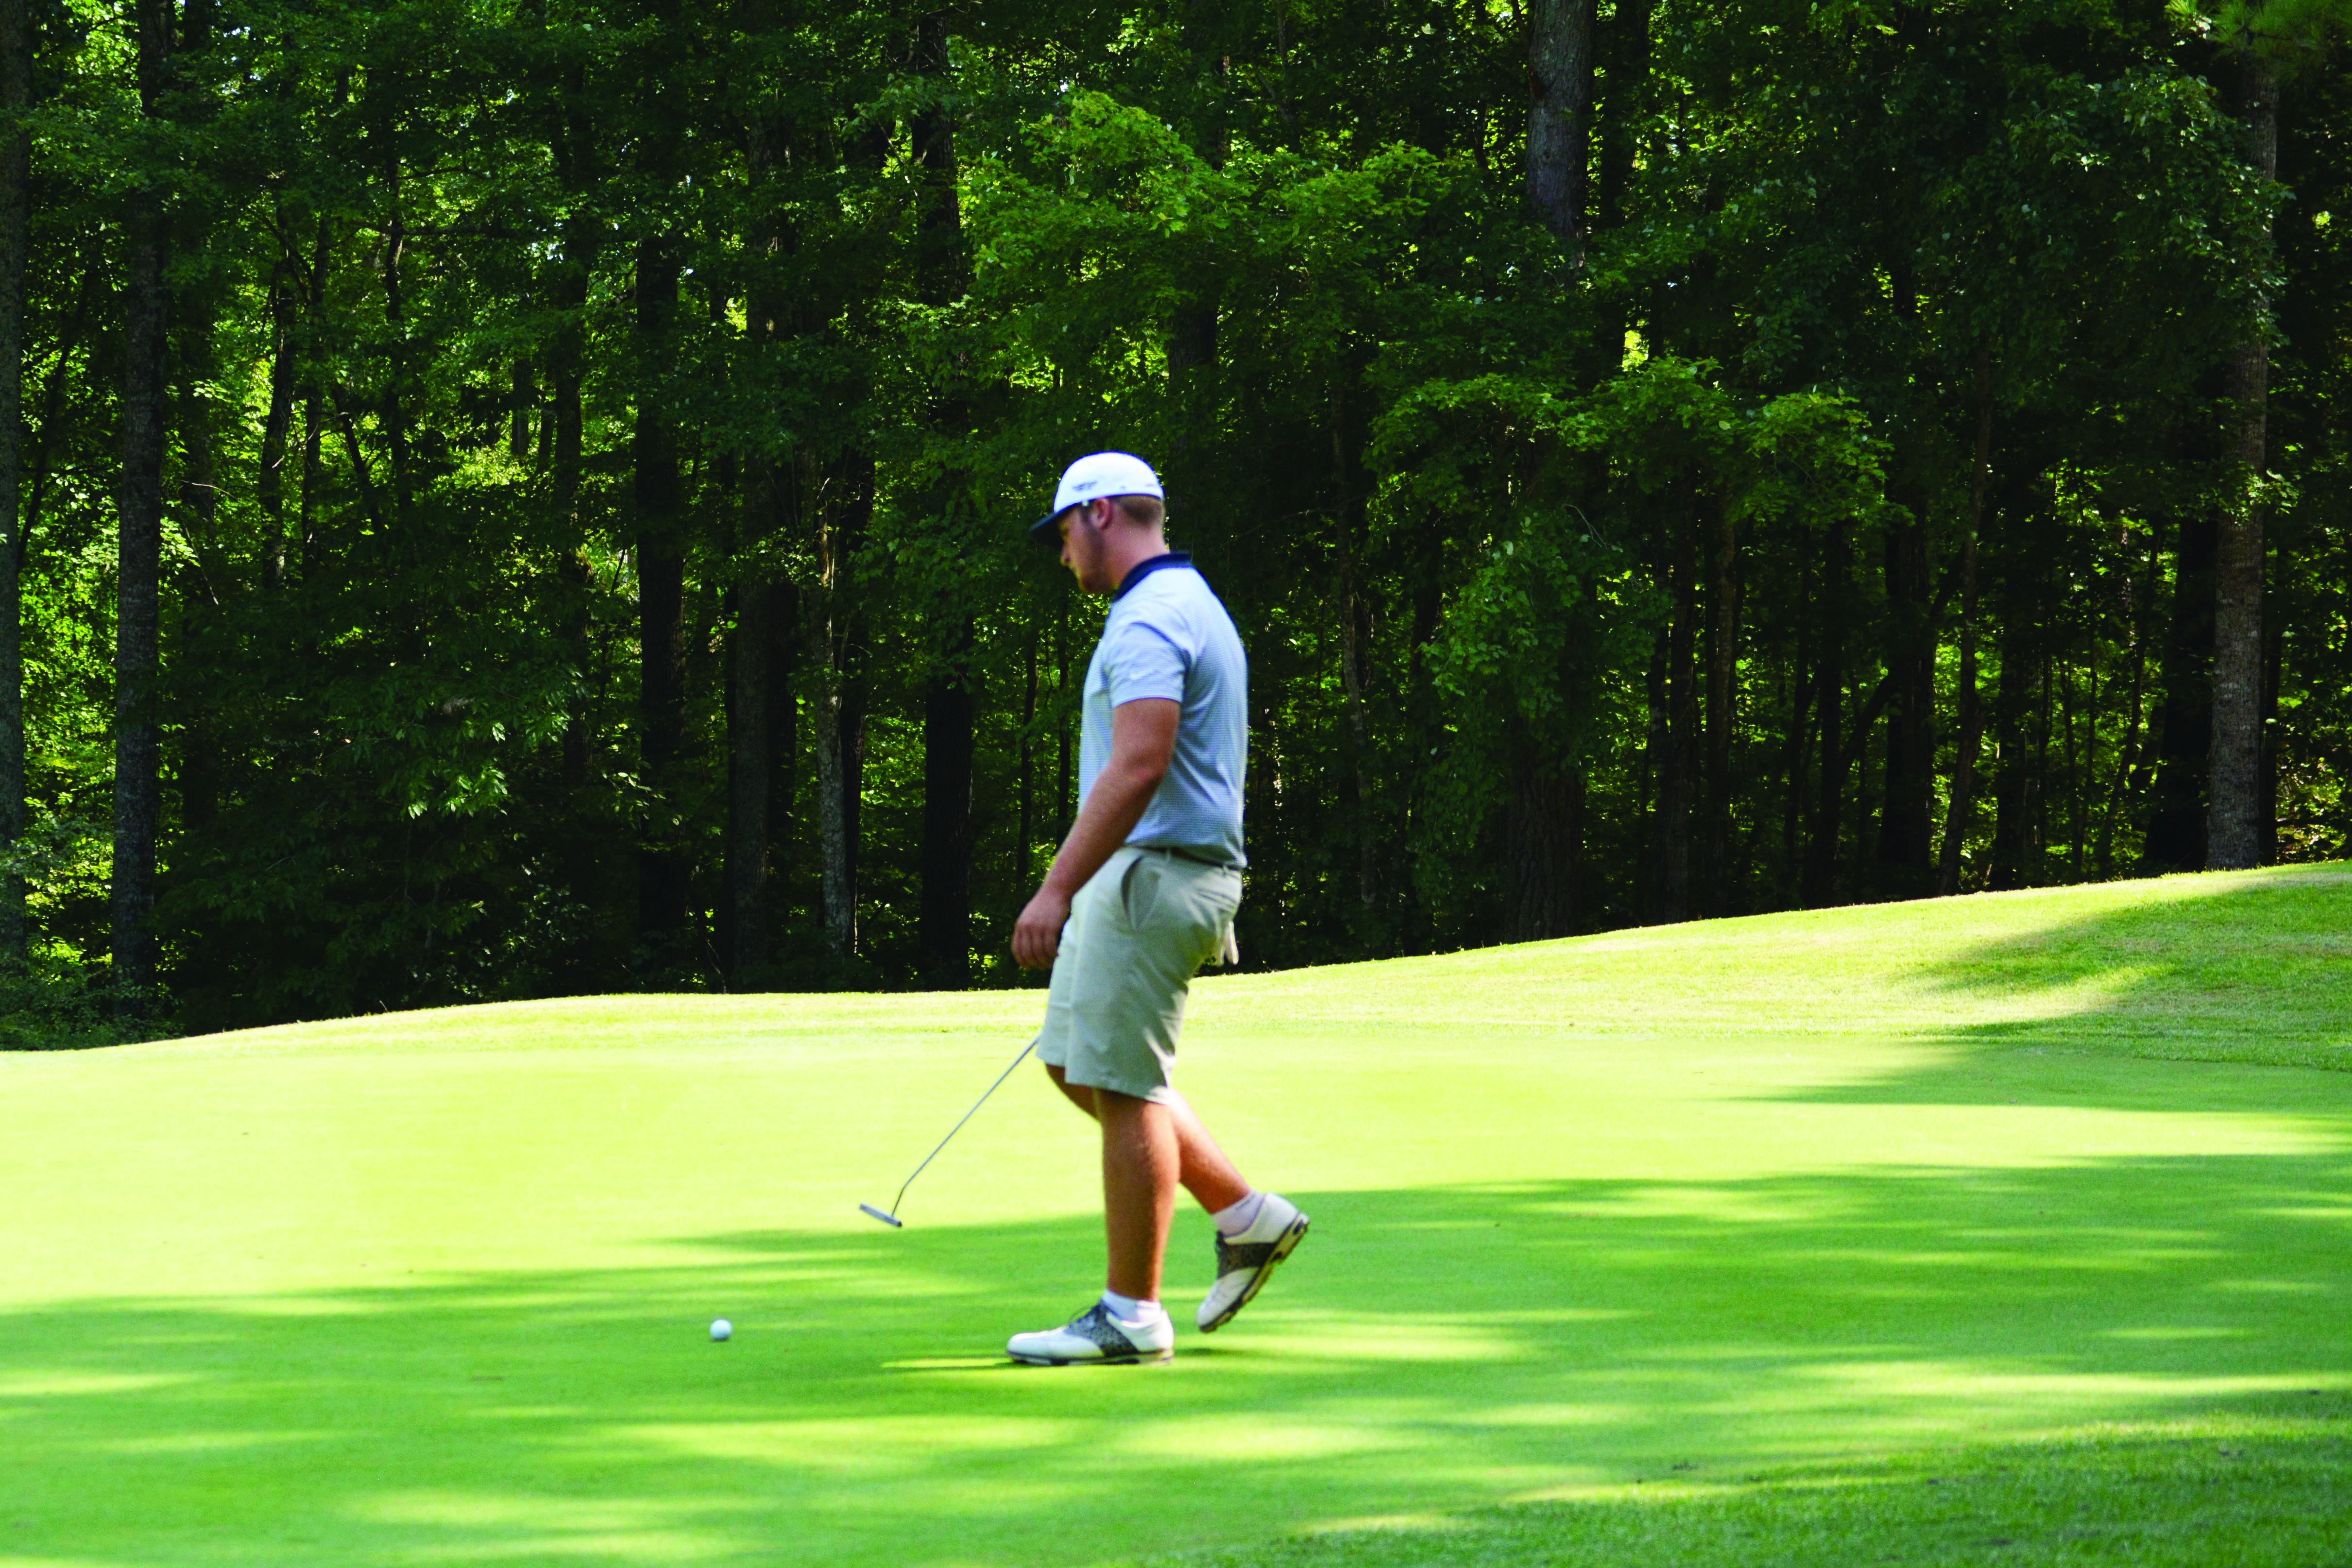 RH Golf is off